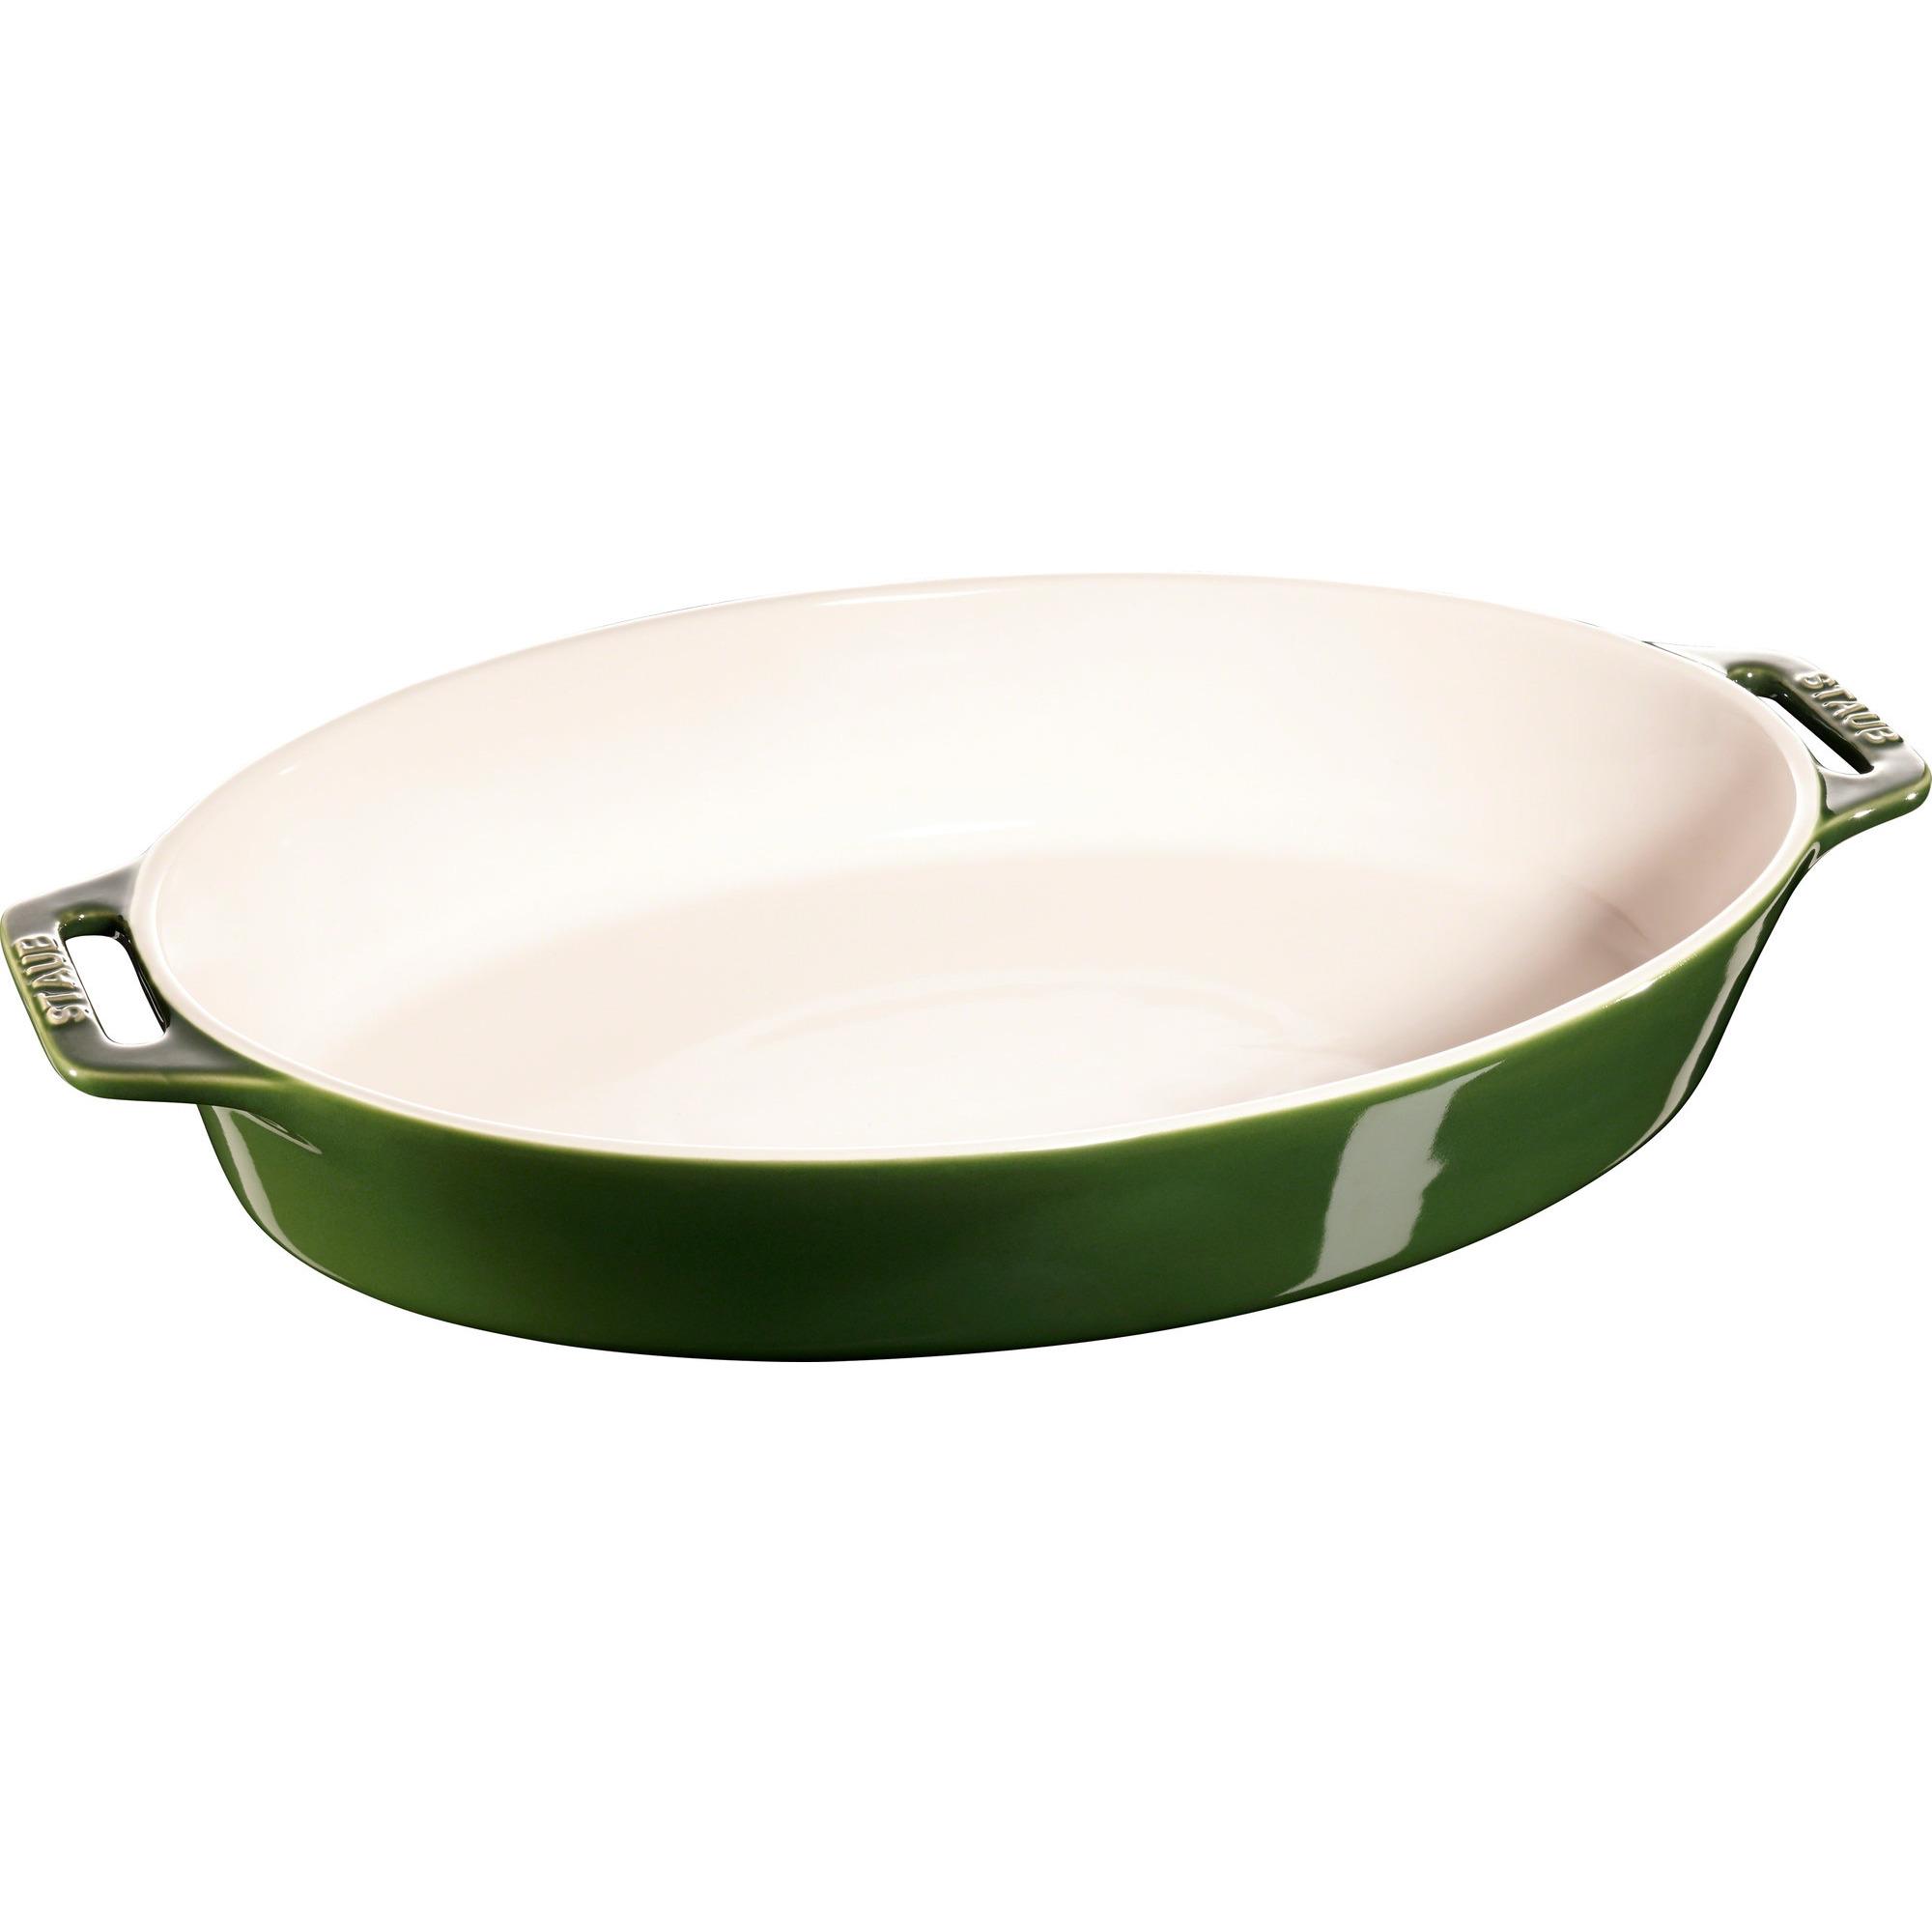 Staub Oval Form 37 cm Grön